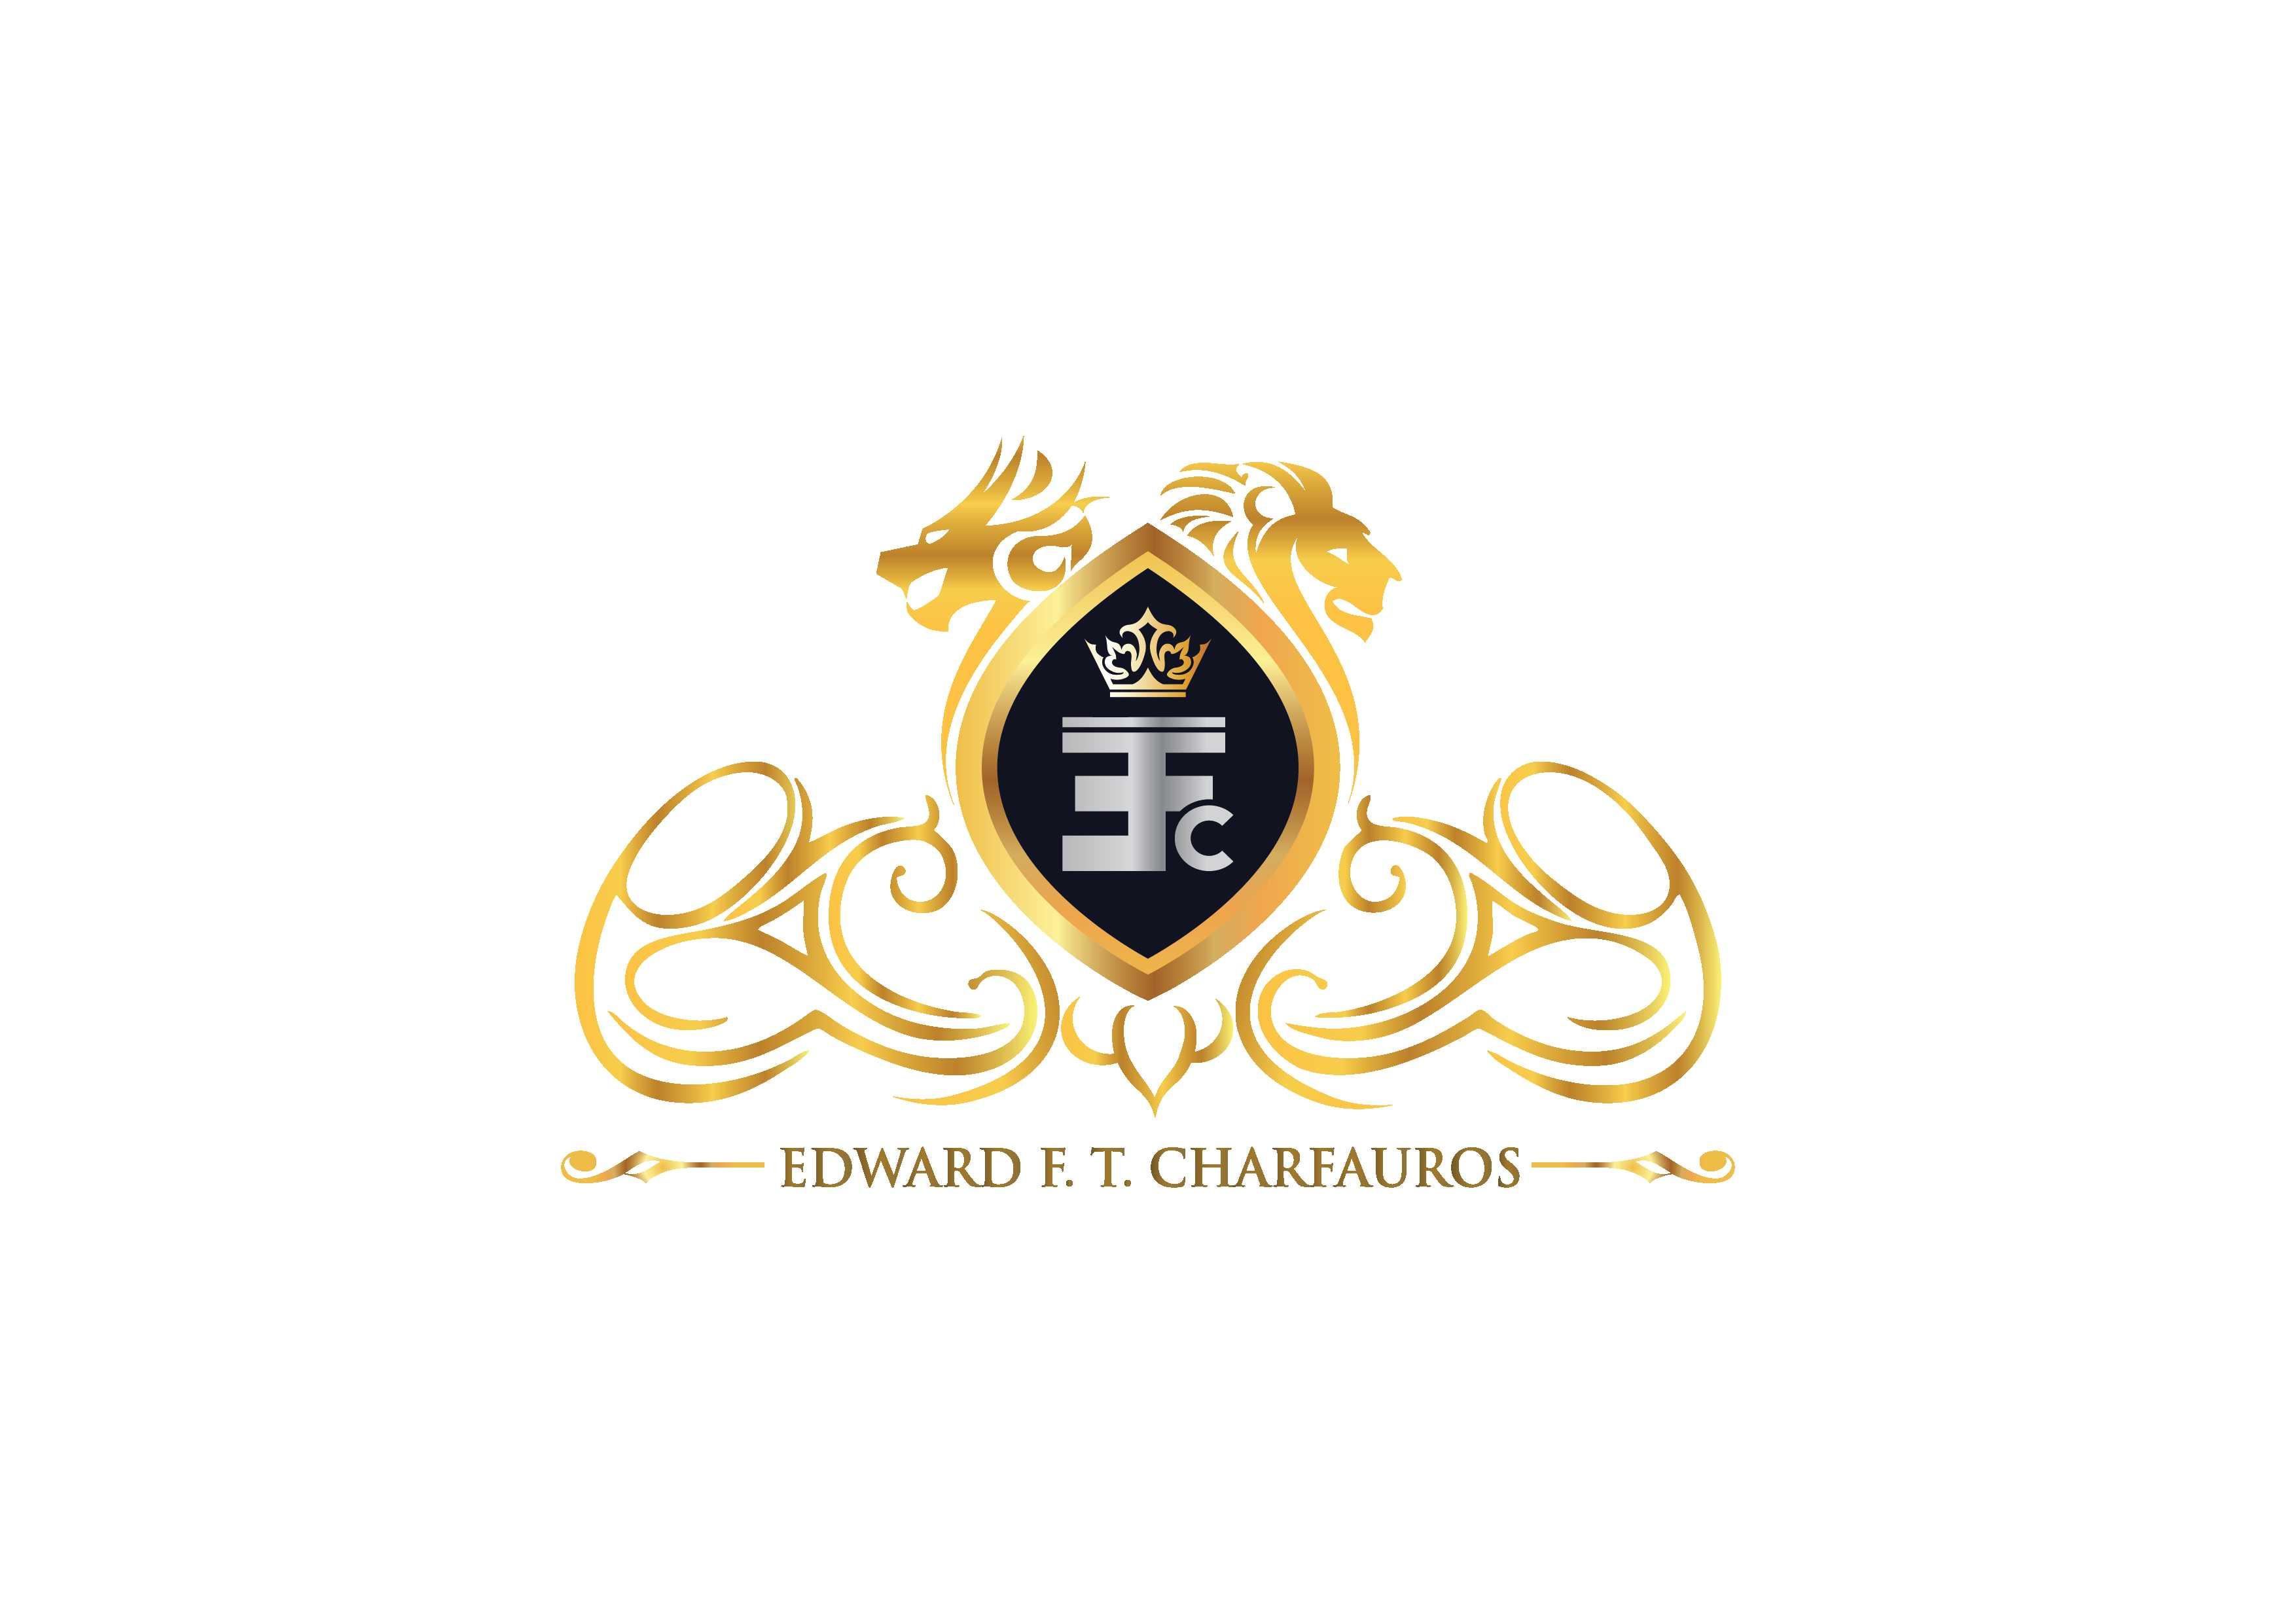 Edward Charfauros Cover Image